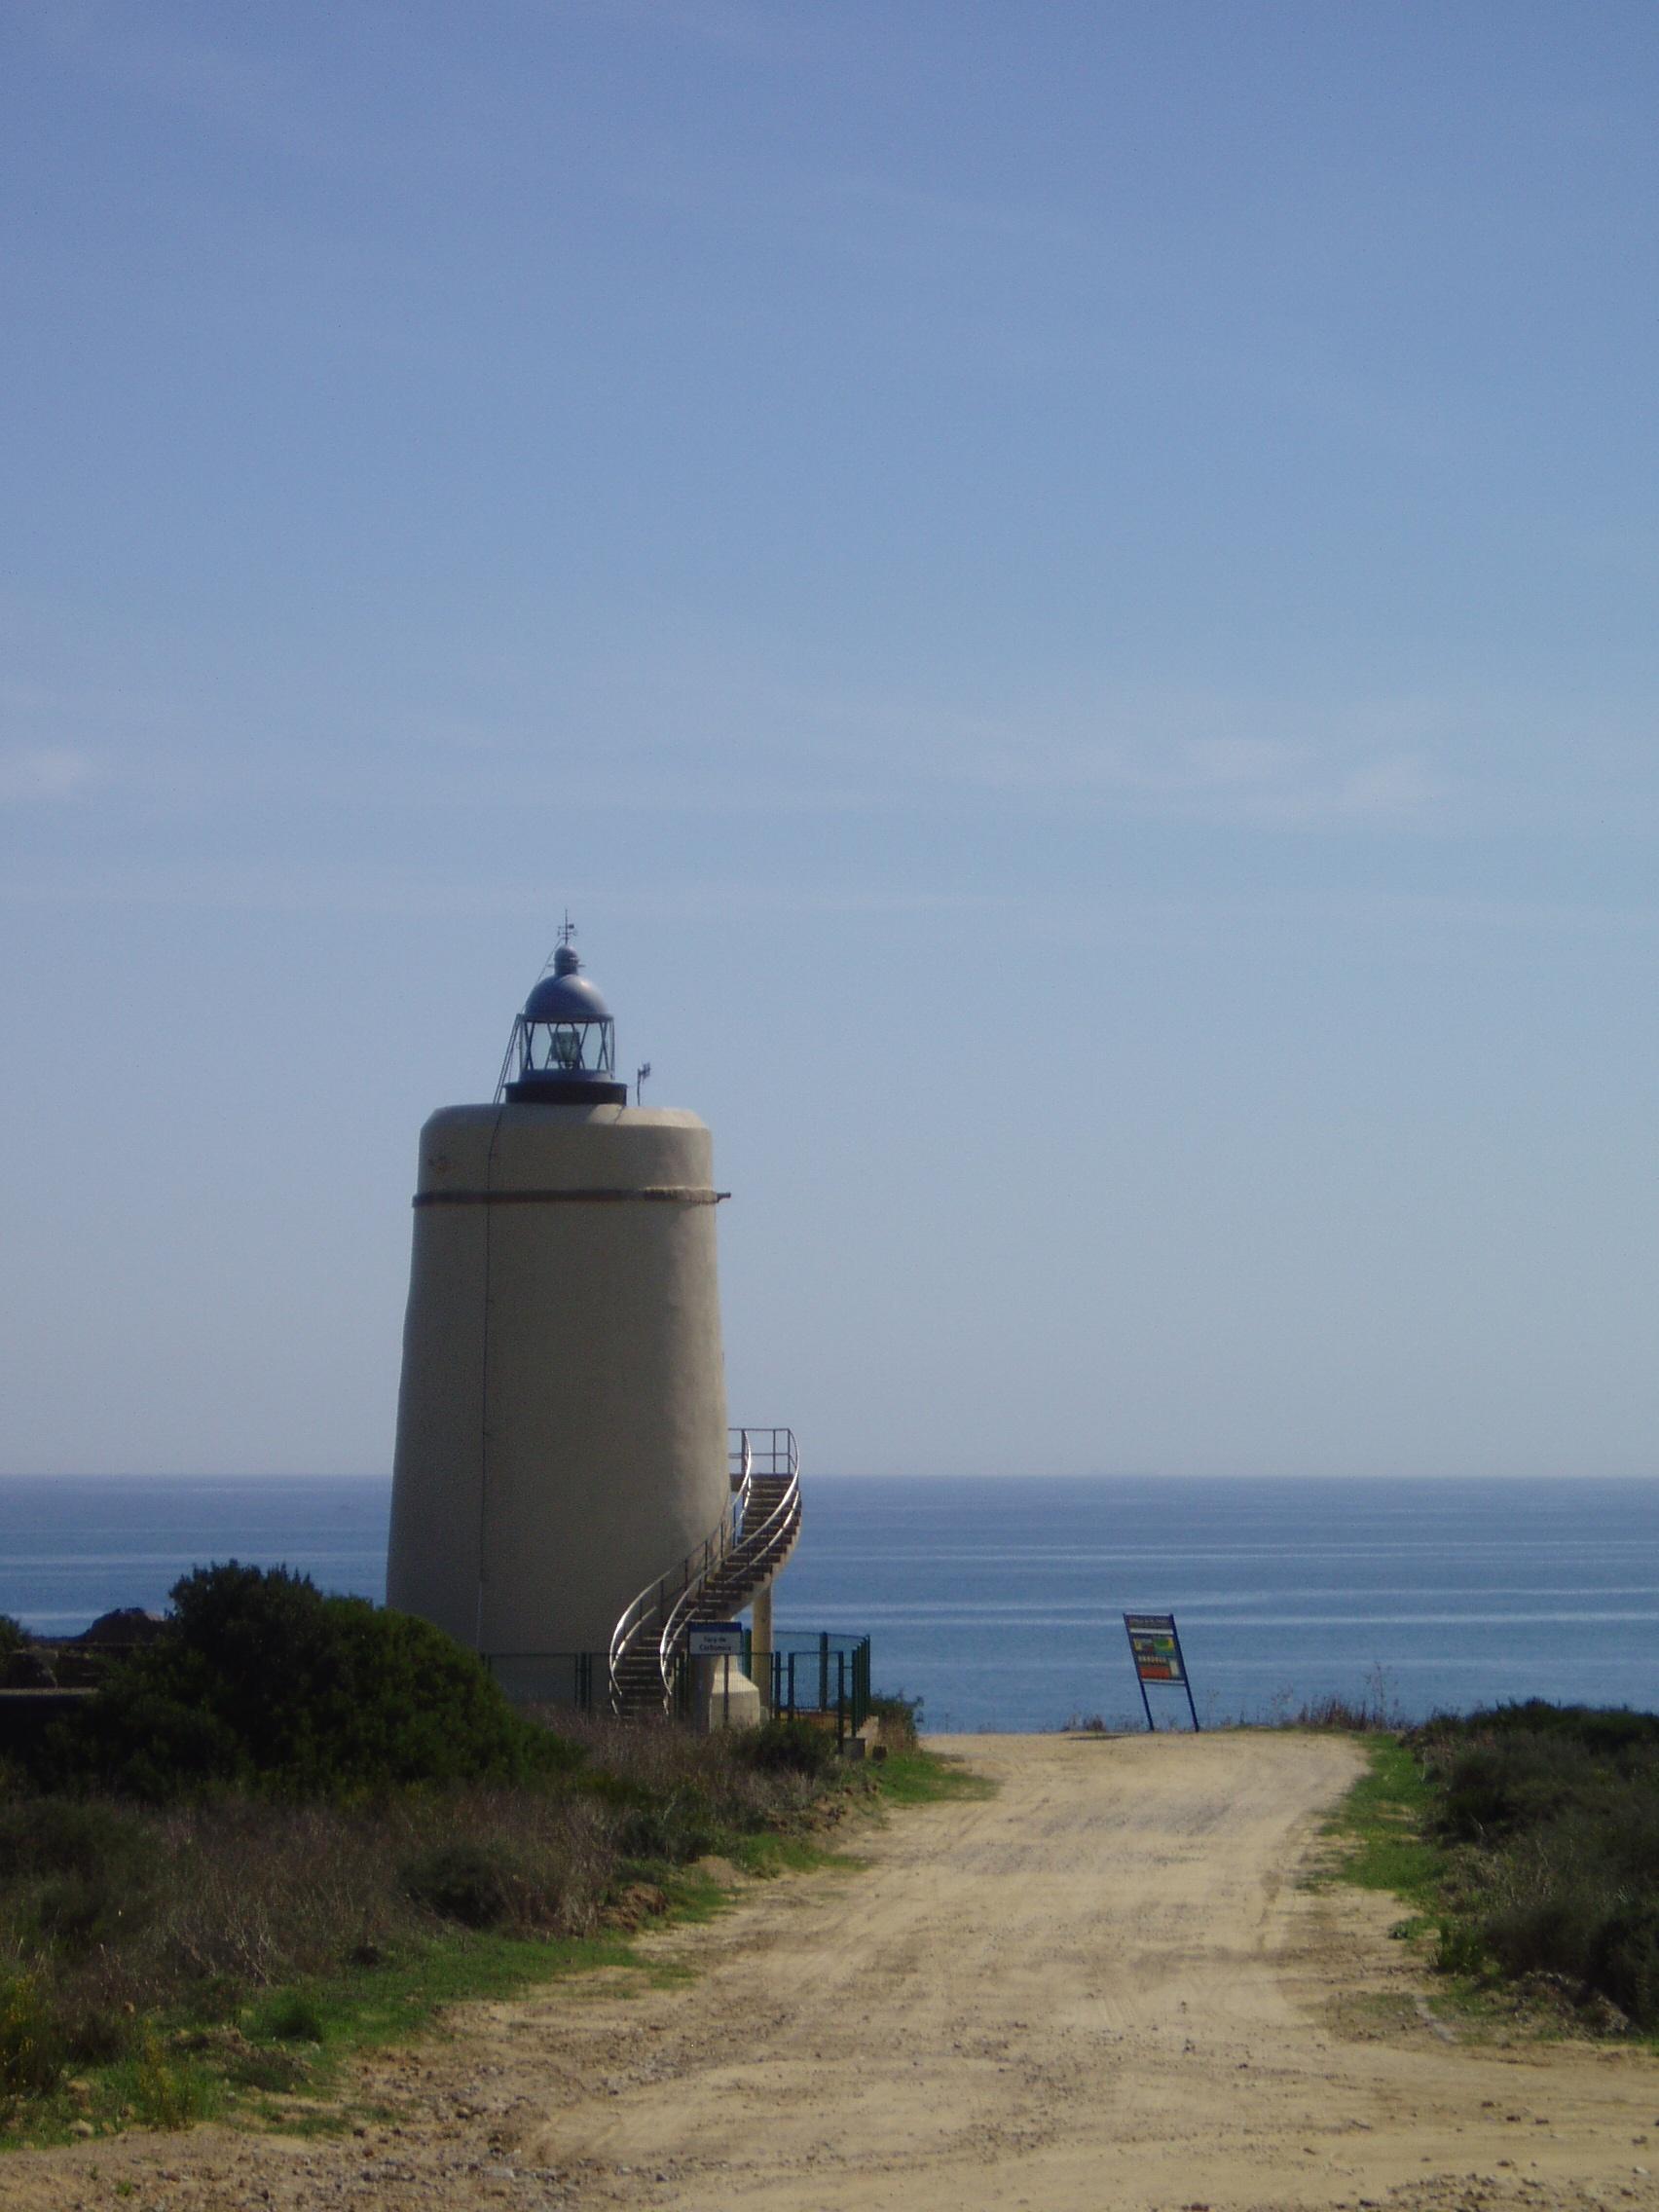 Foto playa Torrecarbonera / El Balneario. Alcaidesa, faro